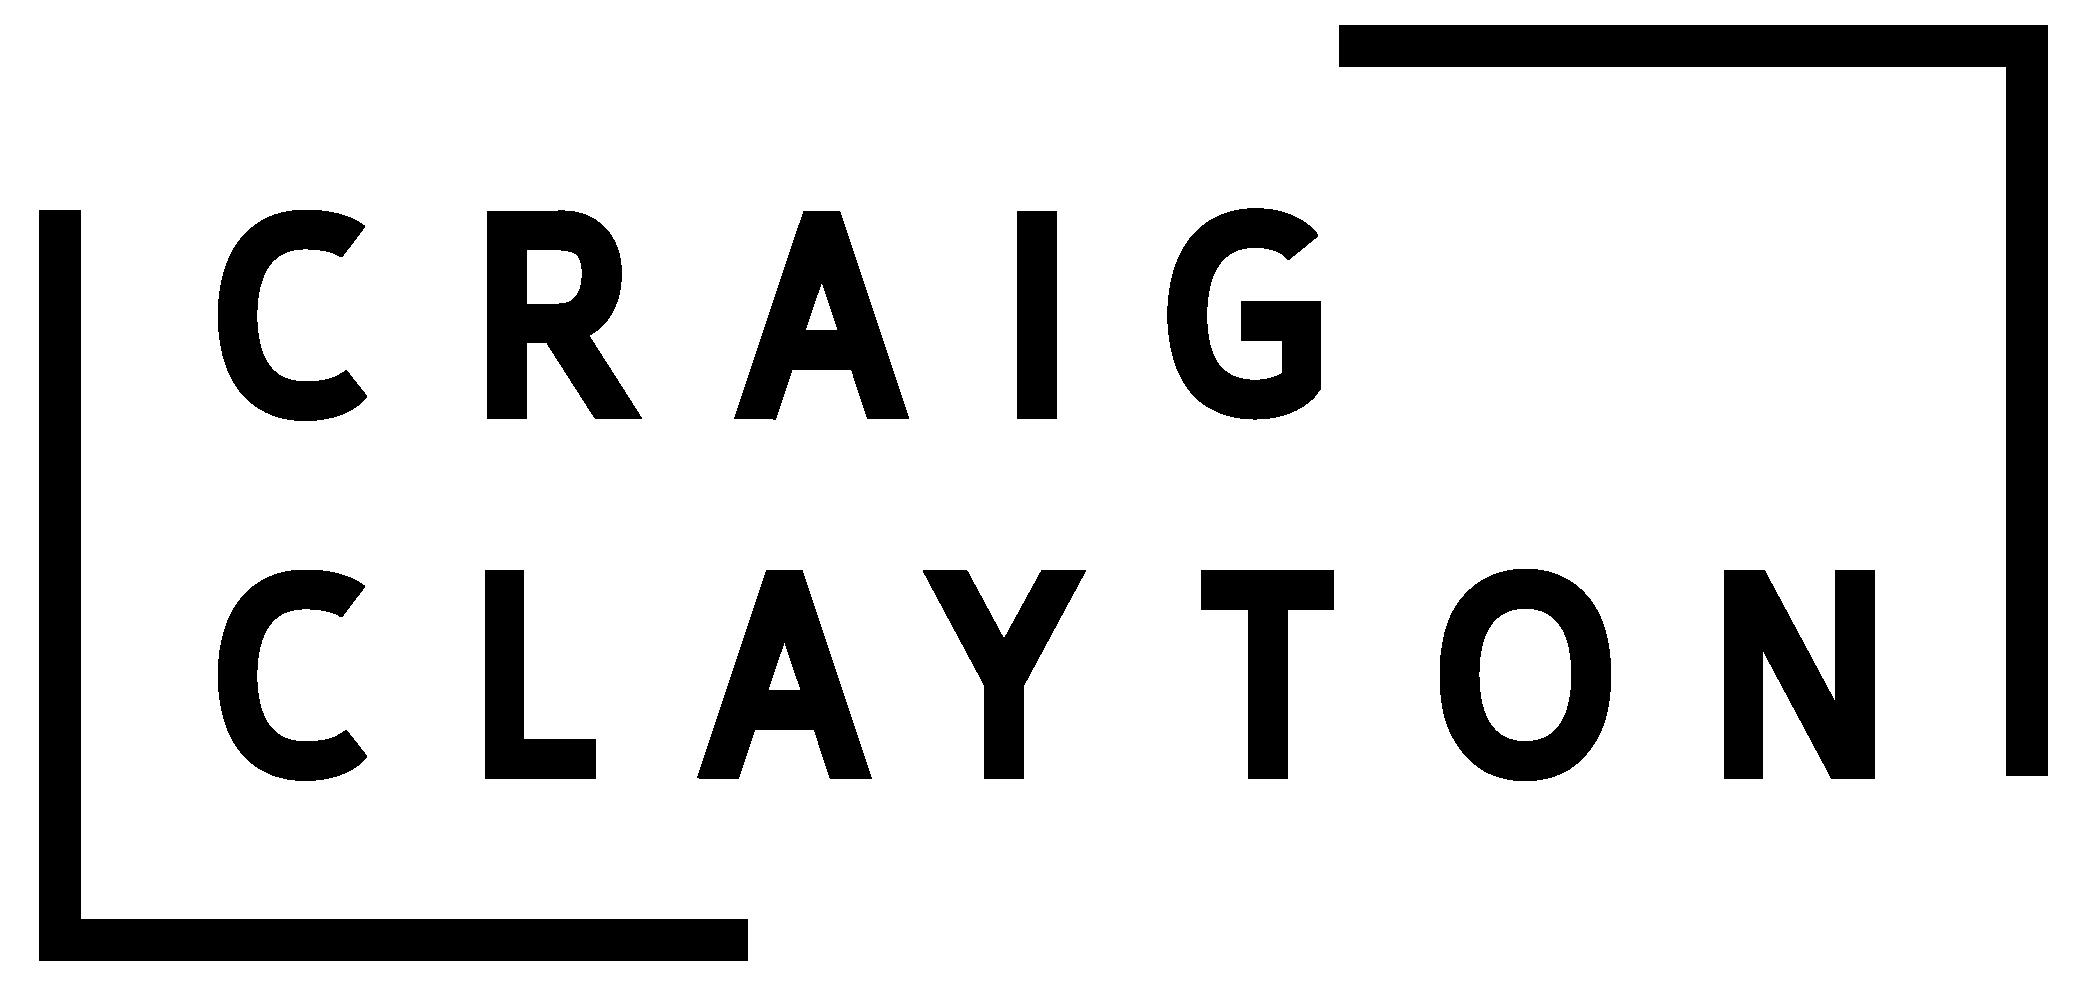 Craig Clayton